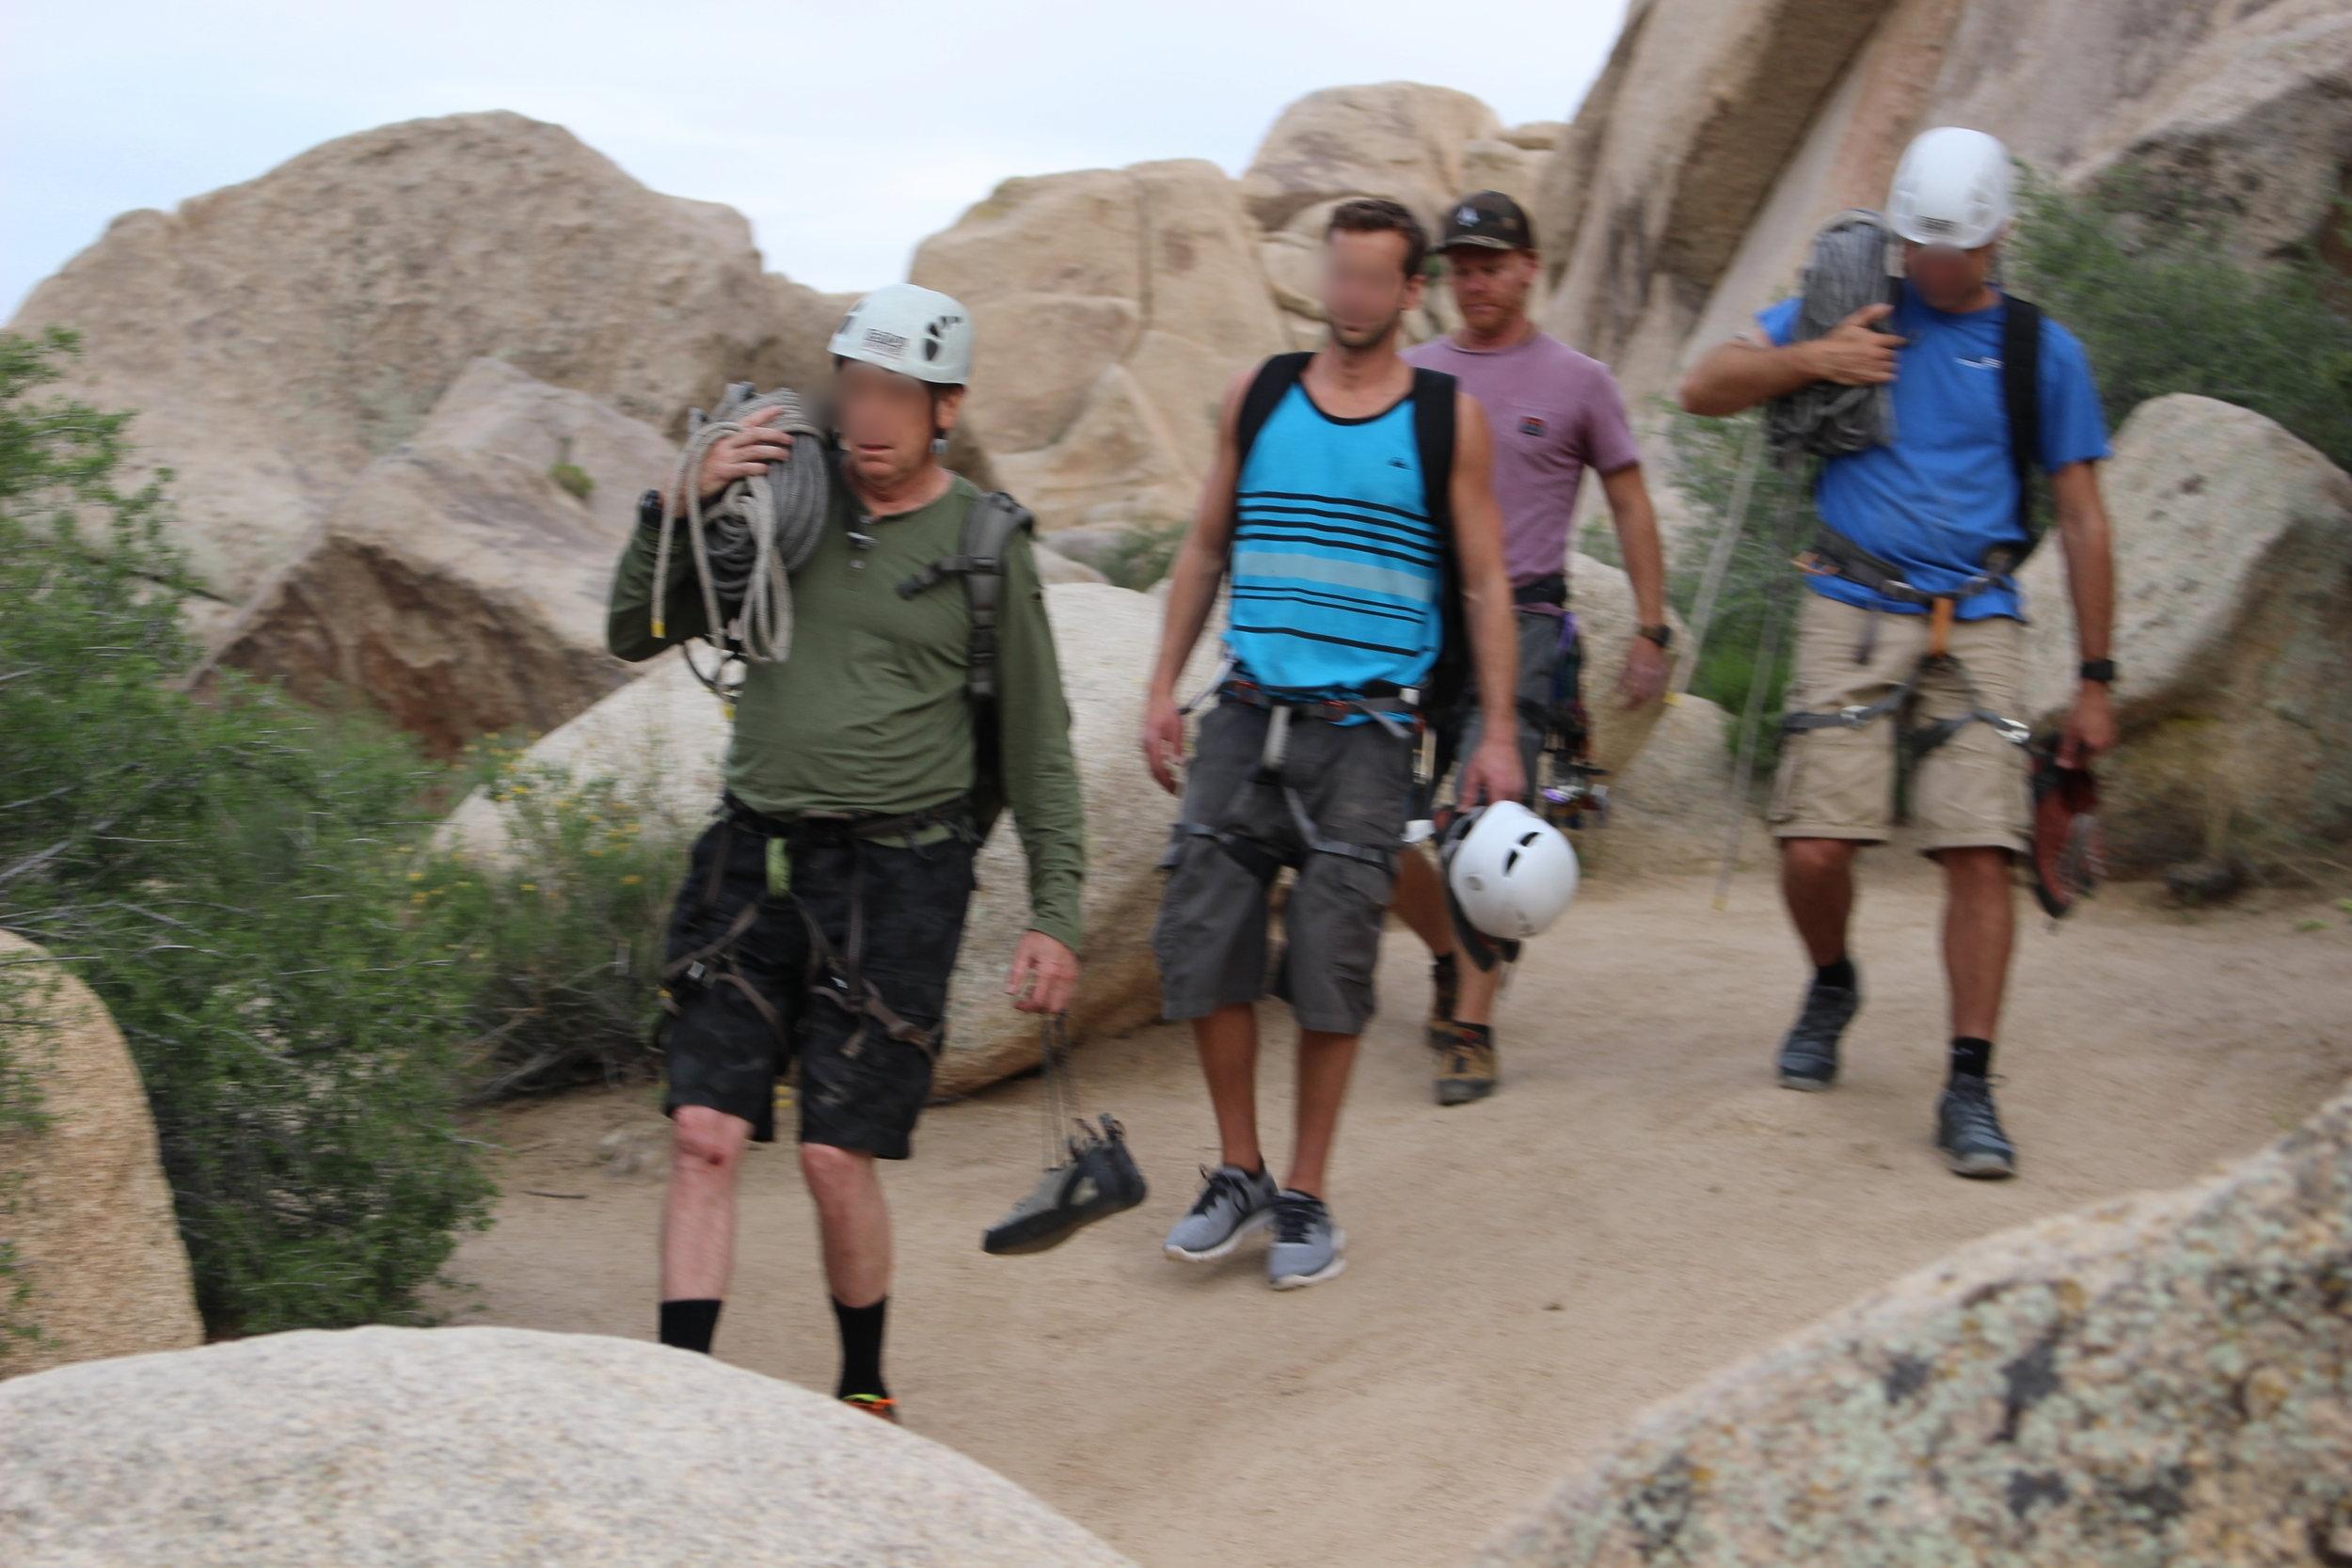 Climbing Joshua Tree Desert STG 001  (3).JPG